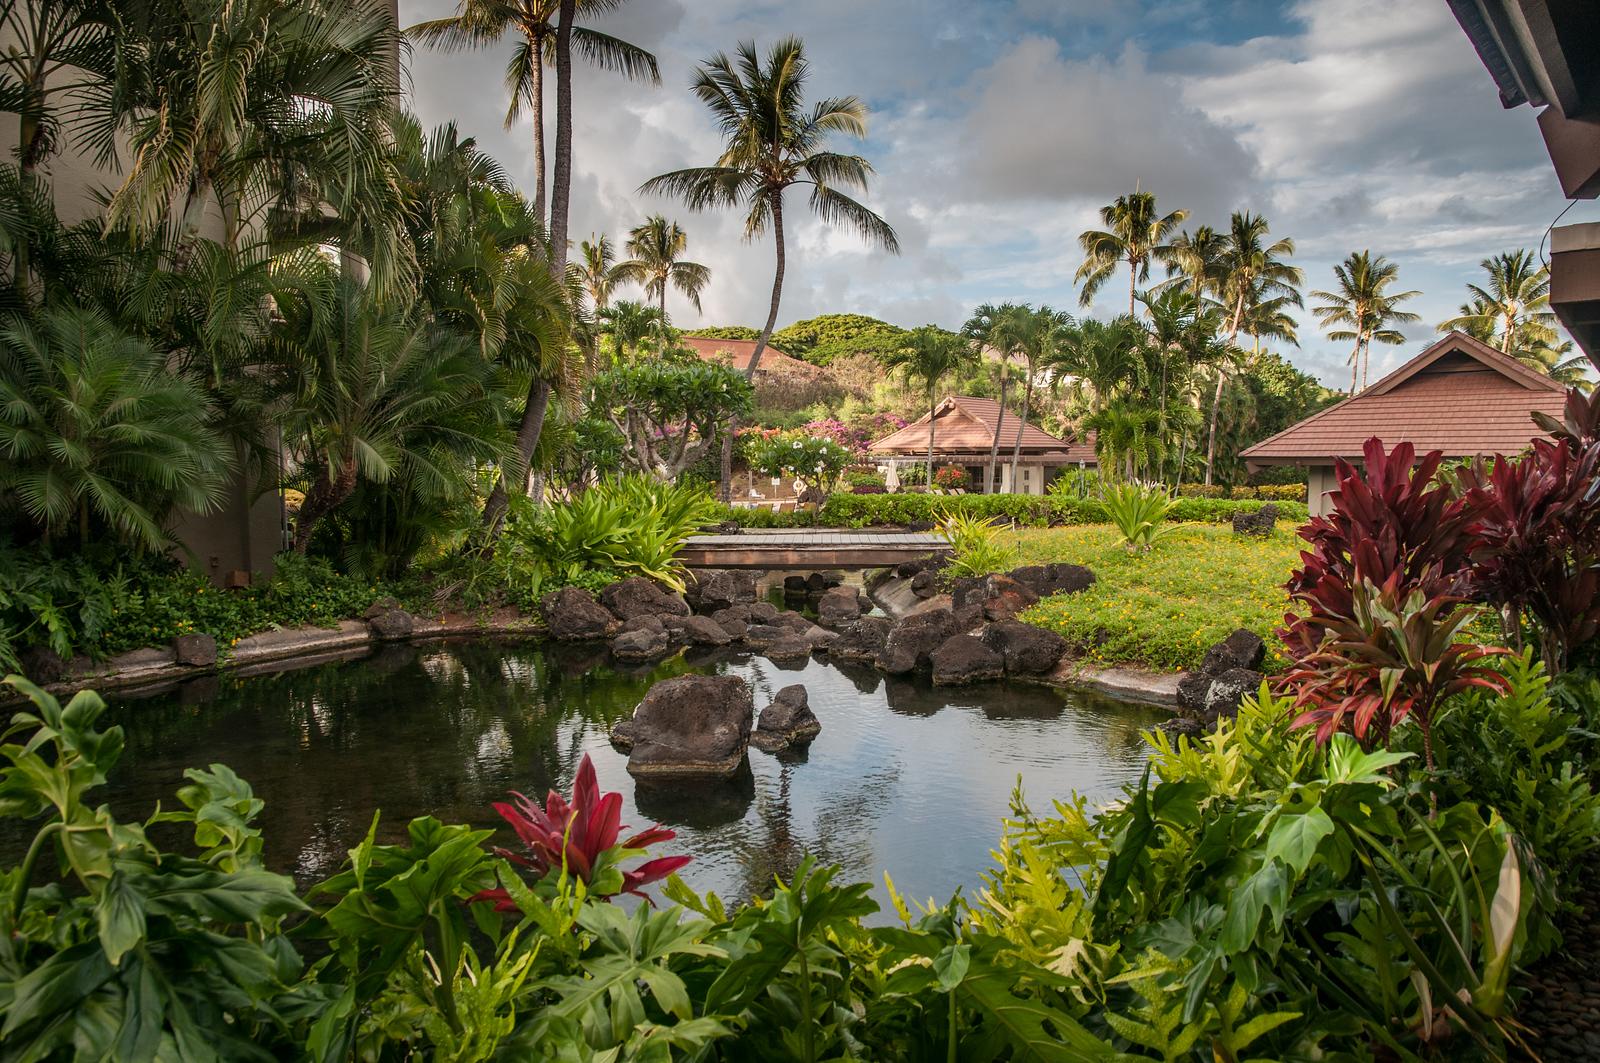 Hawaii 2017; Kauai. Sheraton Hotel at Po'ipu Beach Park